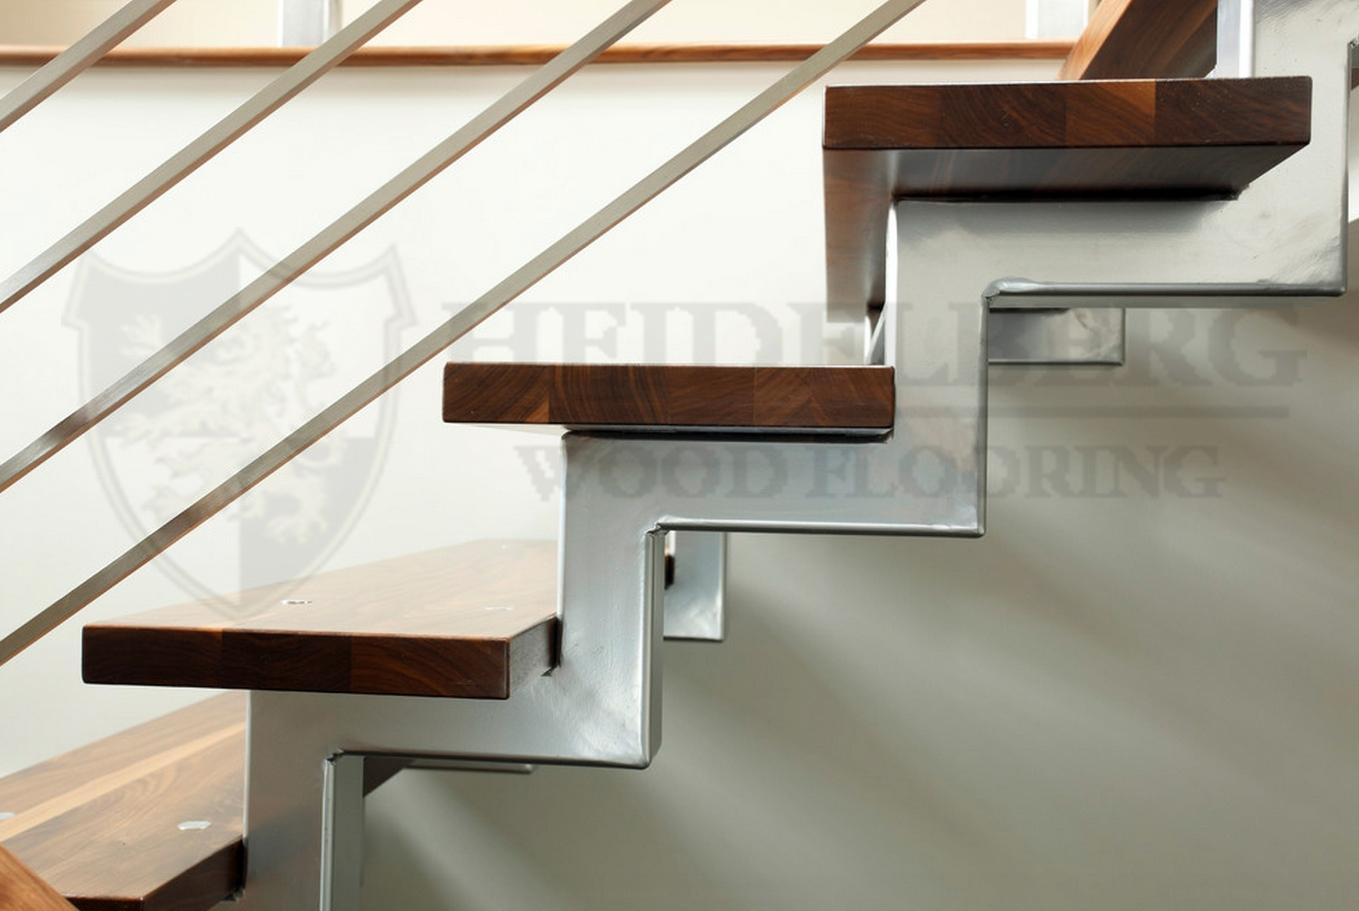 Walnut Grading Regarding Contemporary Stair Treads (#19 of 20)